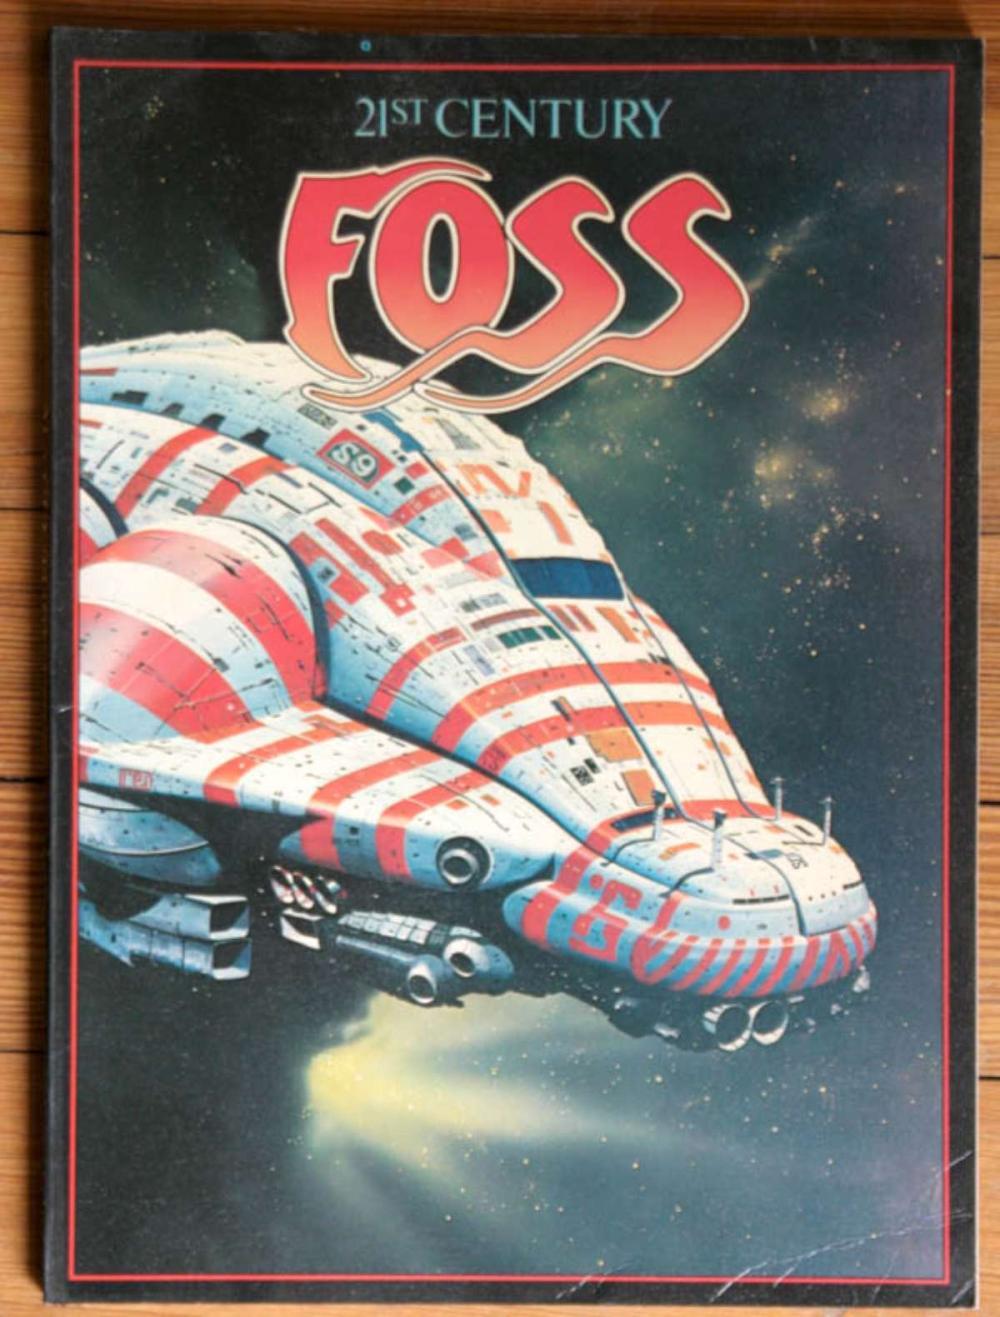 vintage 21st Century Foss science fiction book